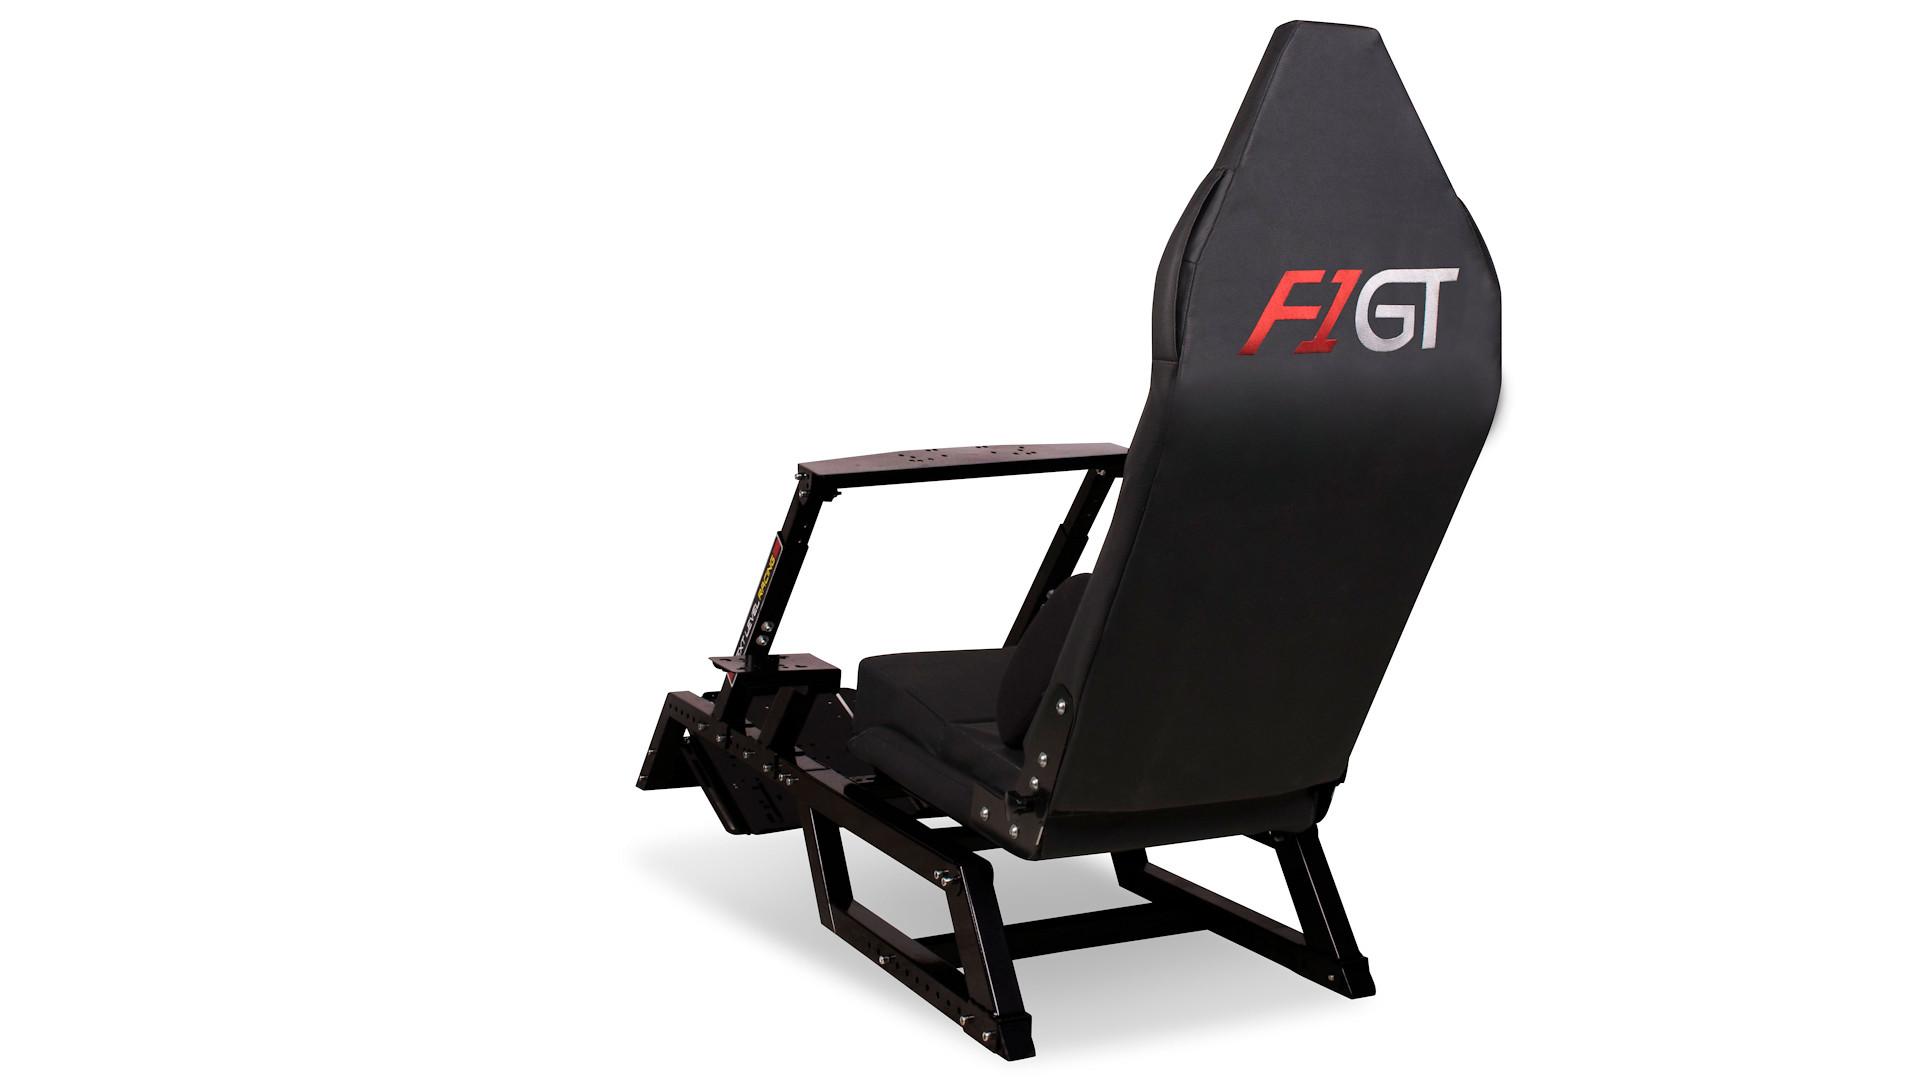 next-level-racing-F1GT-simulator-6